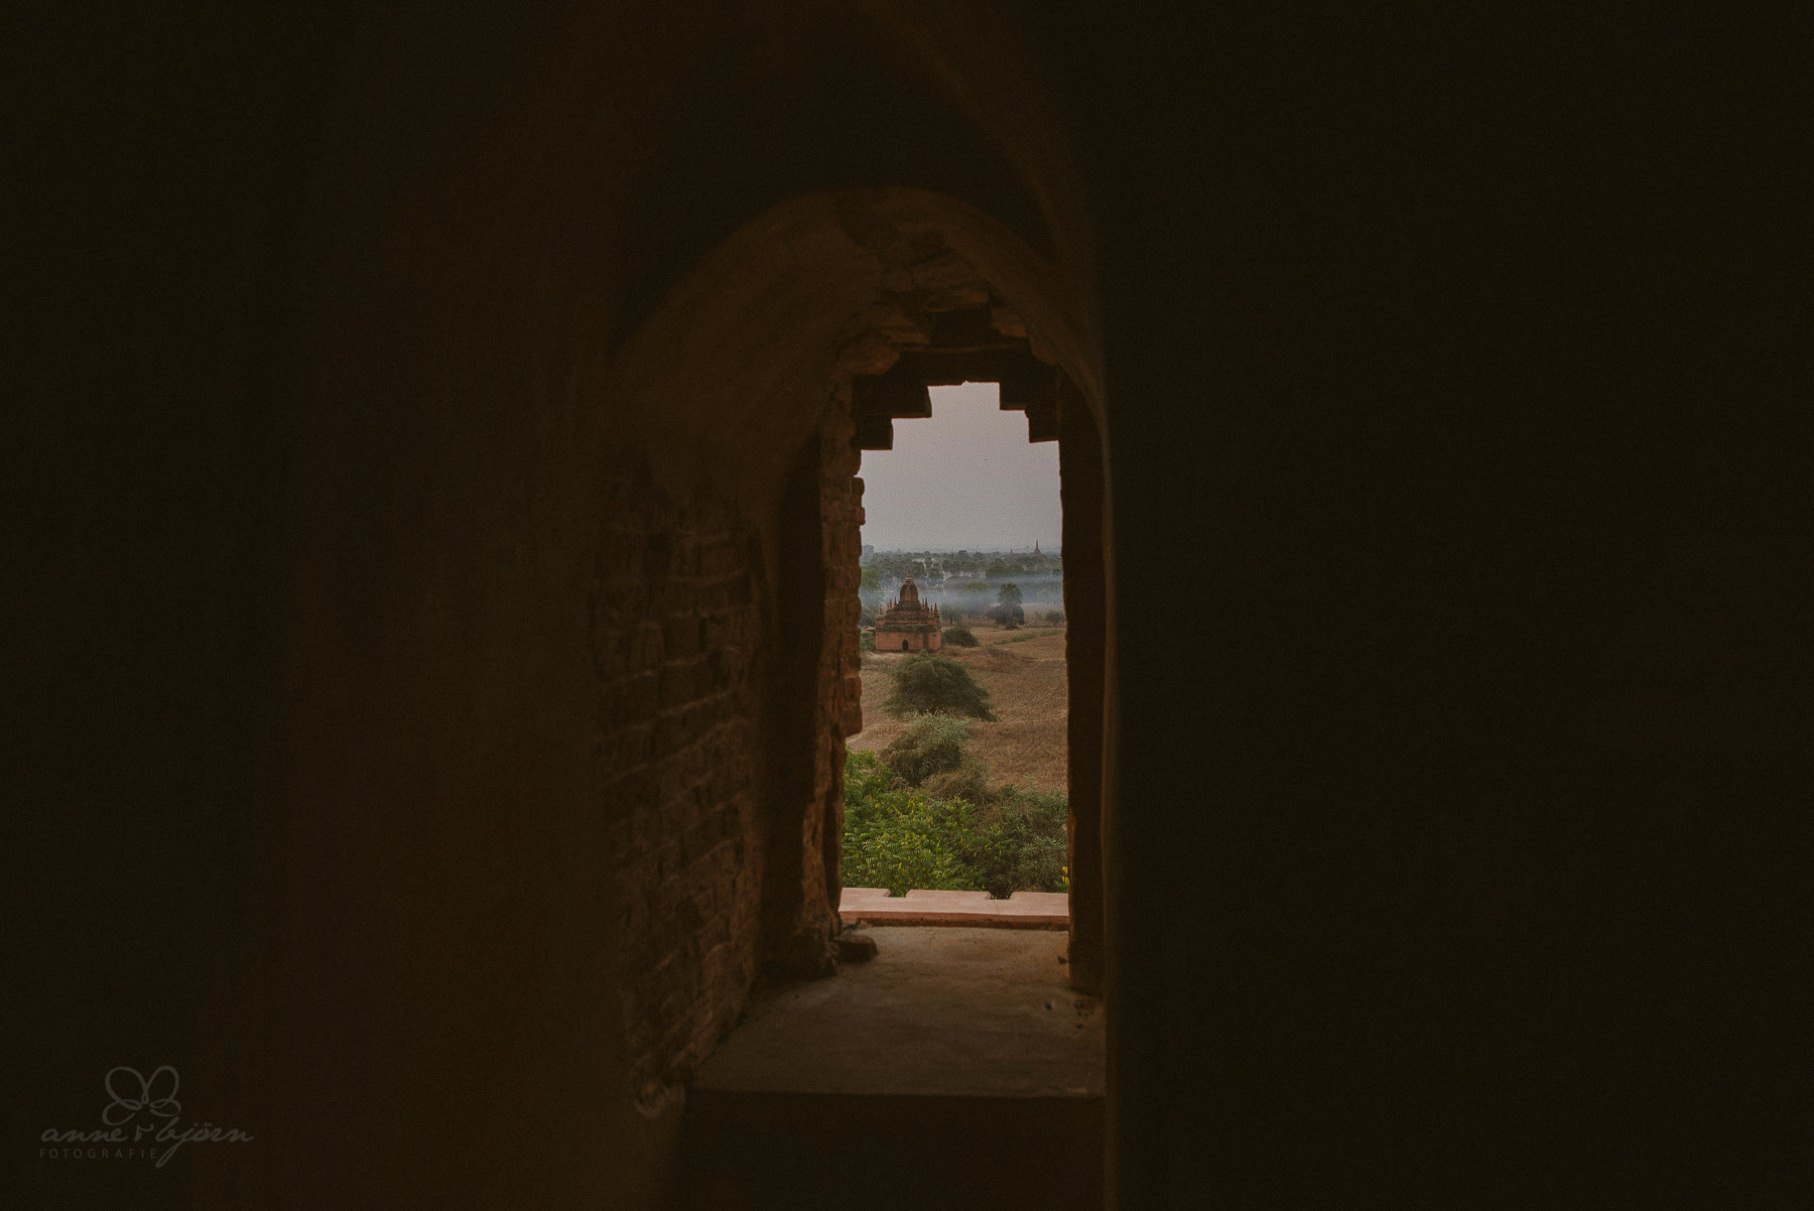 0006 bagan ngwesaung d75 1255 1 - Tempelstadt Bagan & tauchen am Ngwesaungbeach